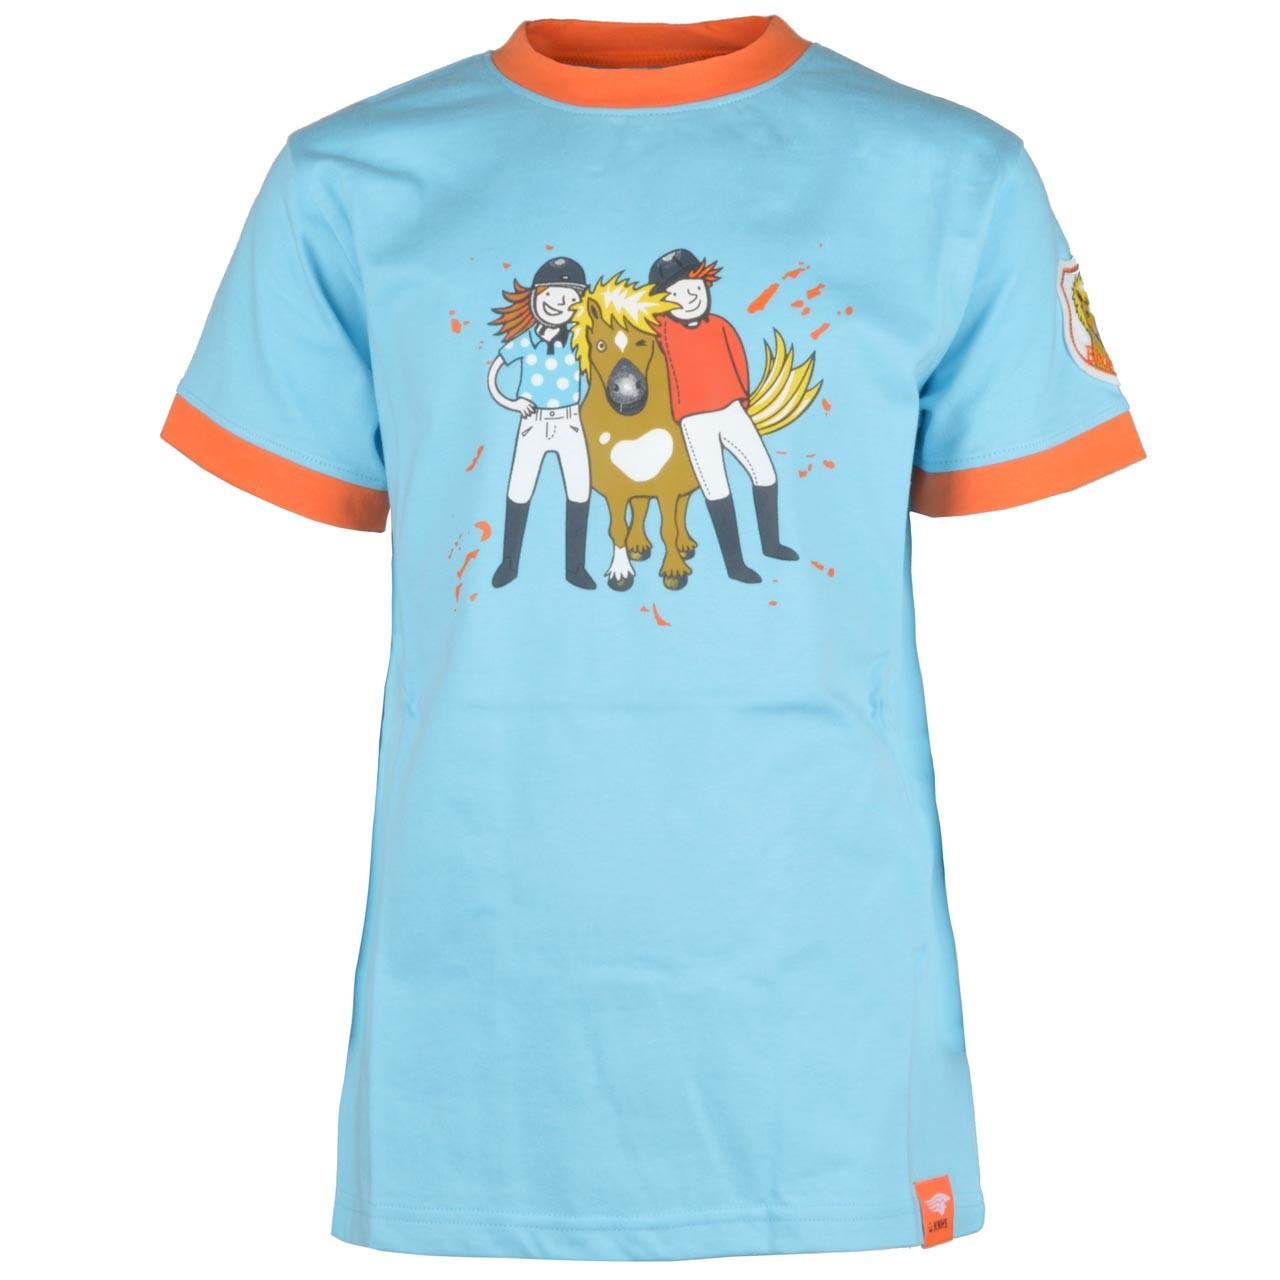 PK T-shirt KNHS bixie